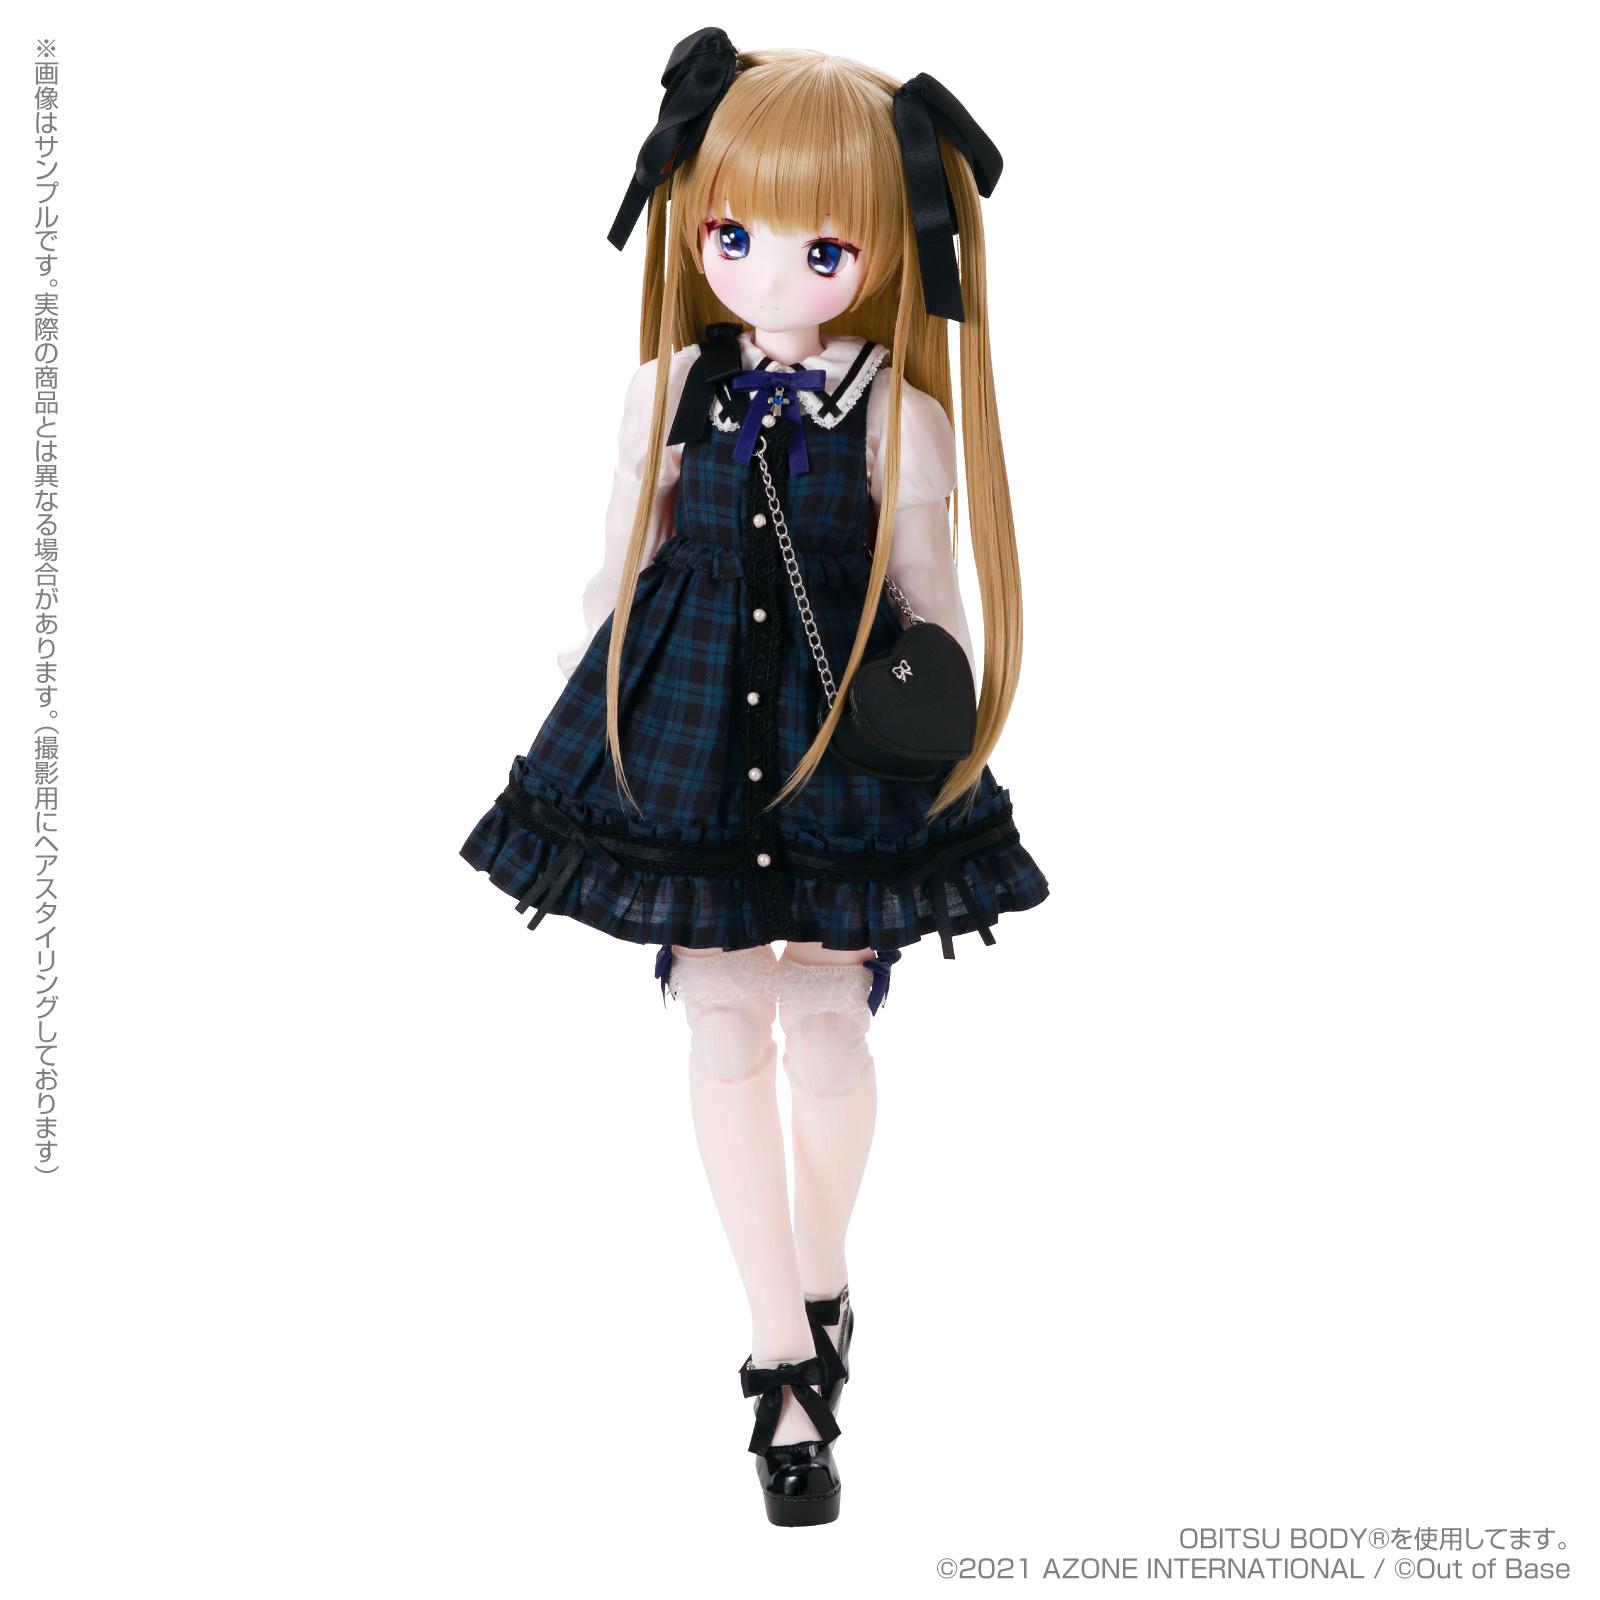 Iris Collect petit『あんな/~Wonder fraulein~Eternal Princess(通常販売ver.)』1/3 完成品ドール-011